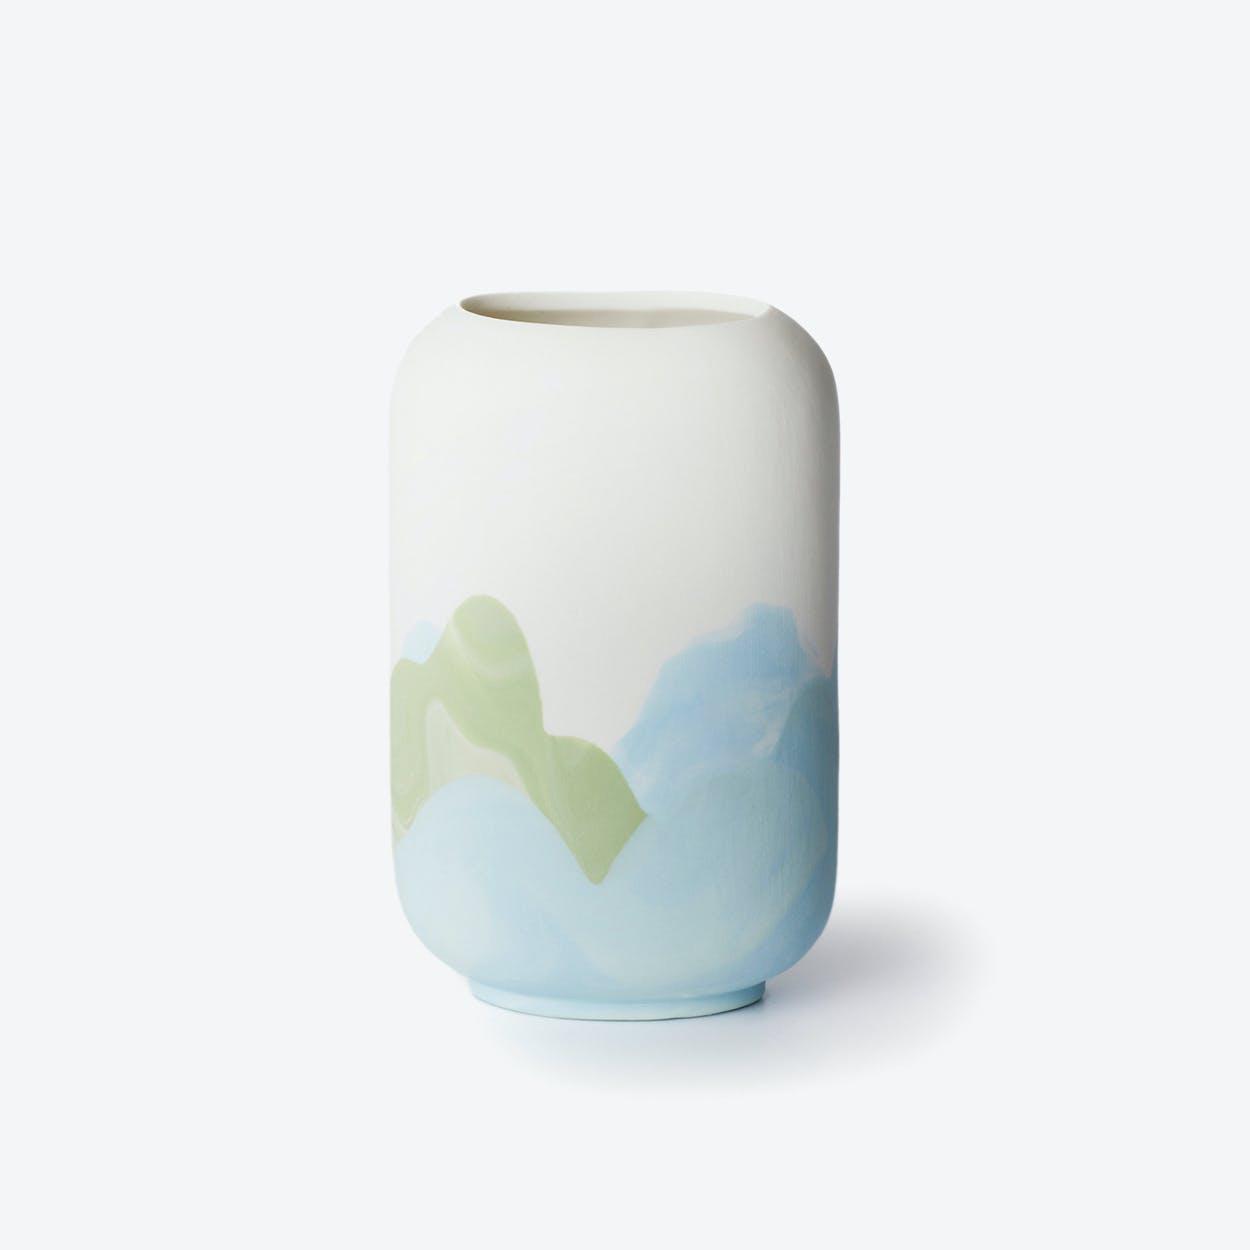 Porcelain Hong Kong Inspired Vase - Kennedy Town